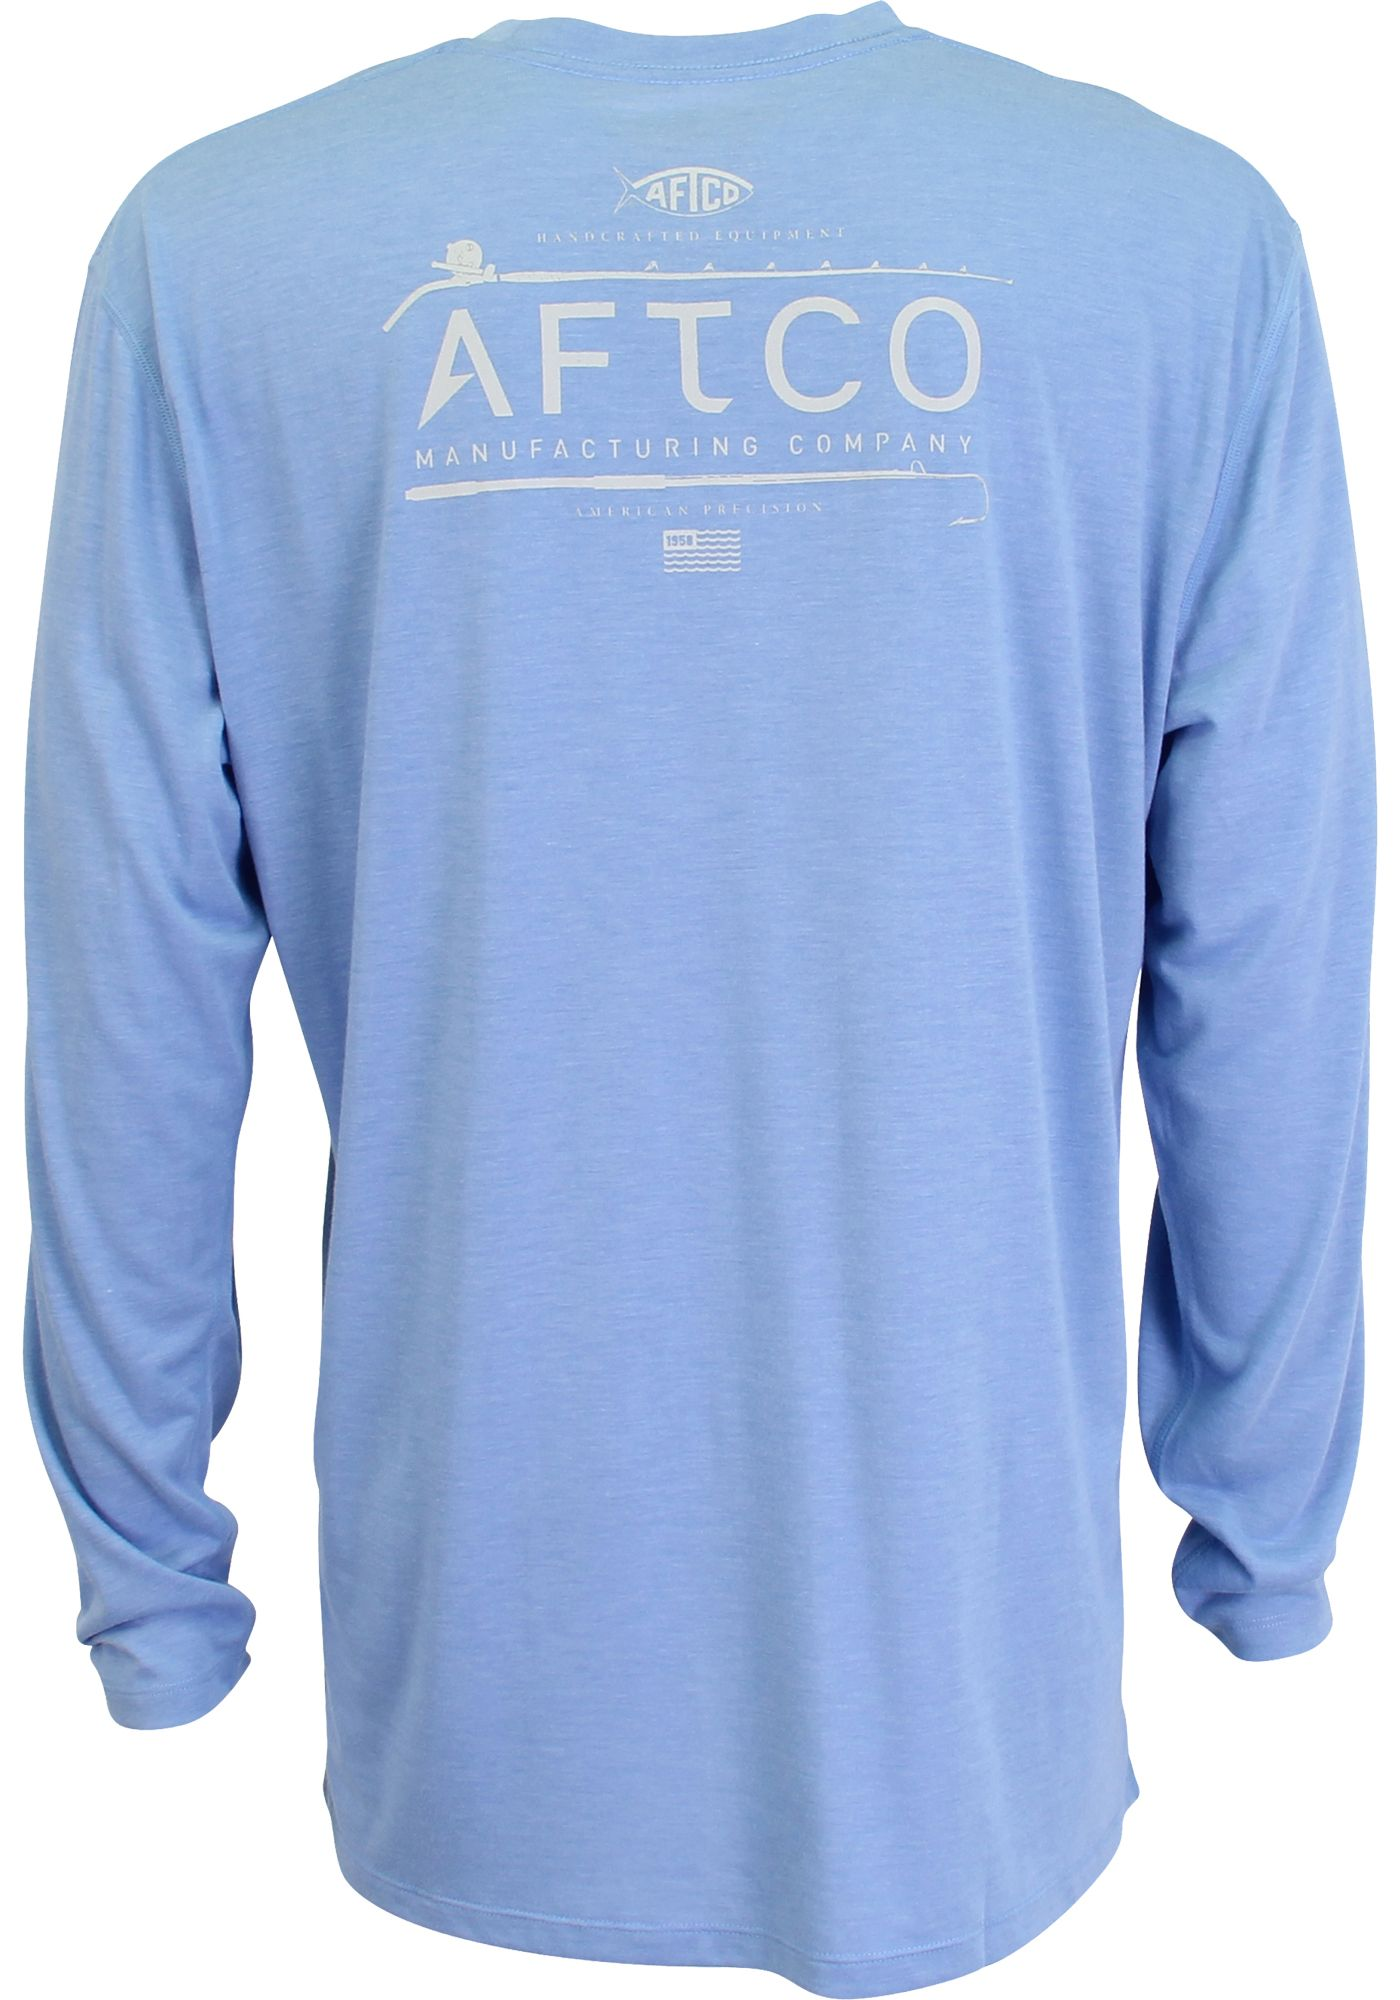 AFTCO Mens' Fishtale Performance Long Sleeve Shirt